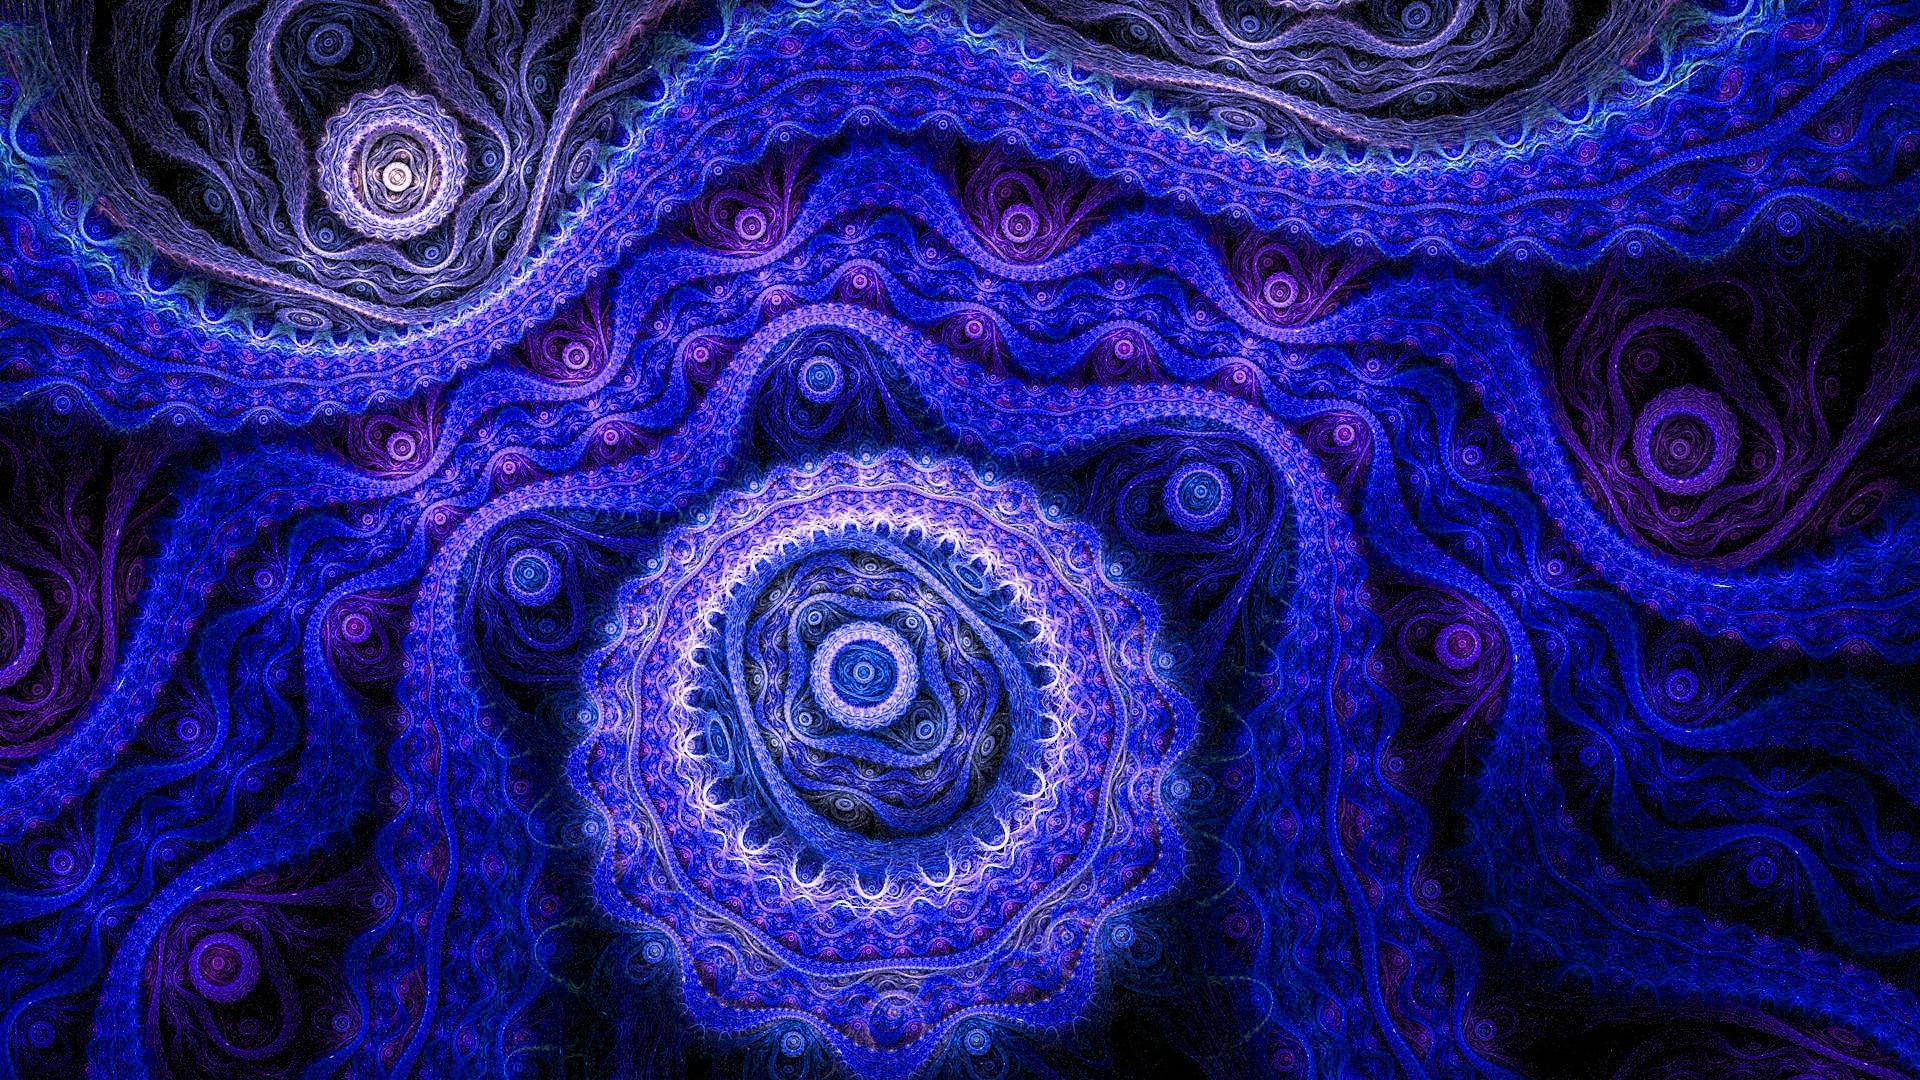 Blue and purple fractal - Design wallpaper